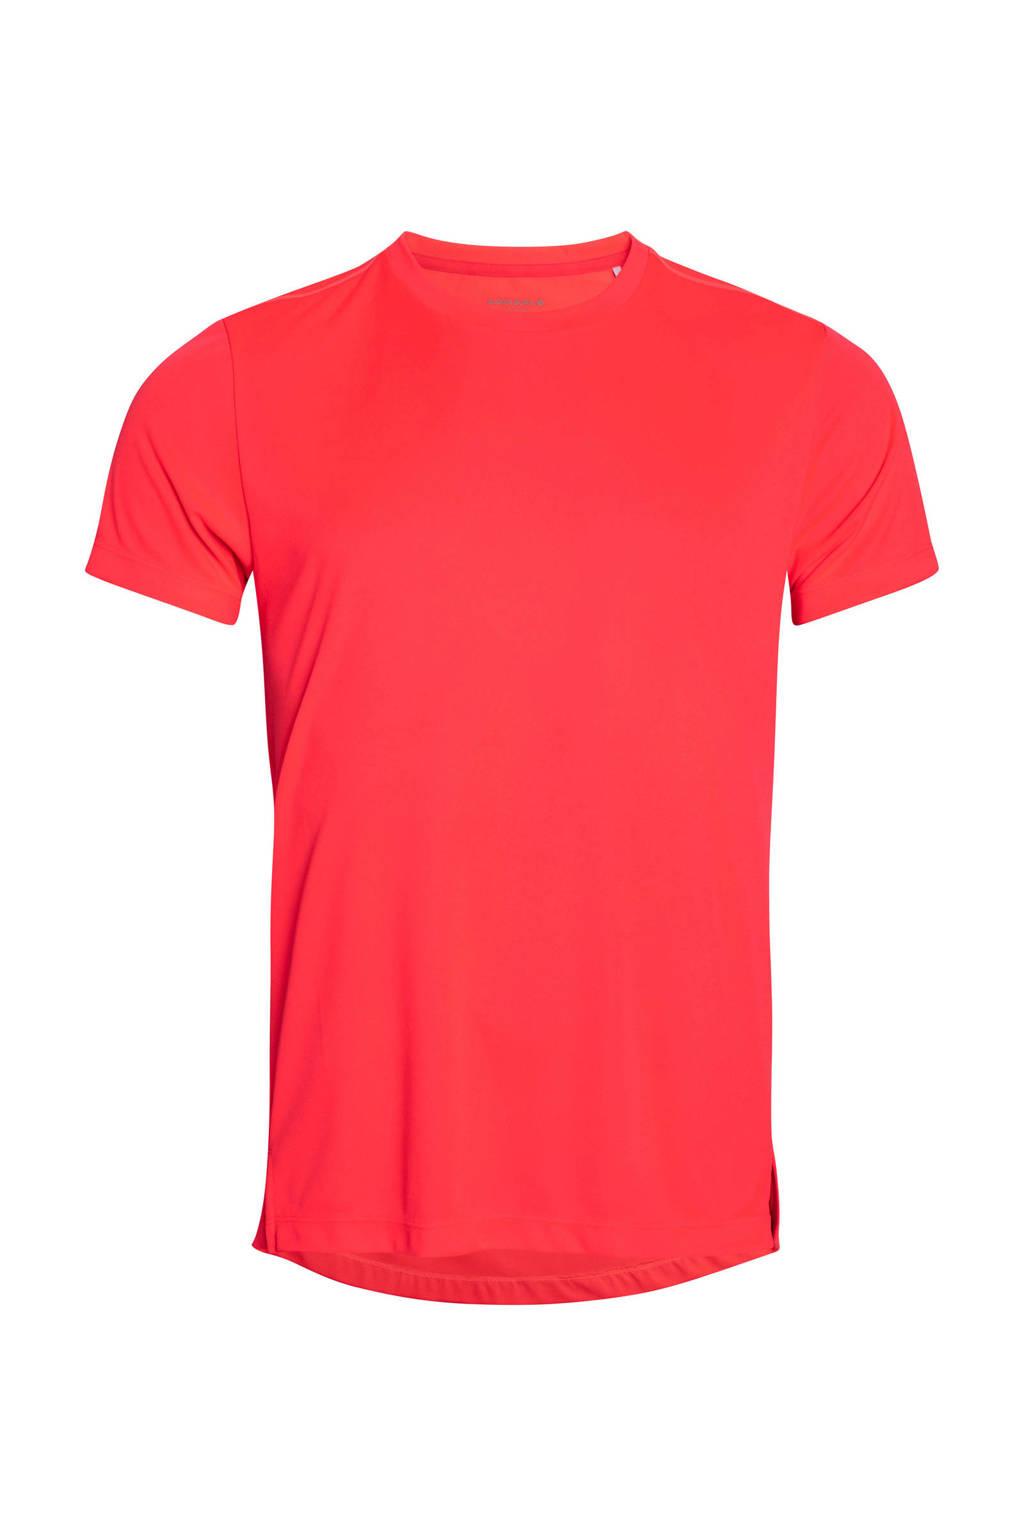 Björn Borg   sport T-shirt rood, Rood/wit